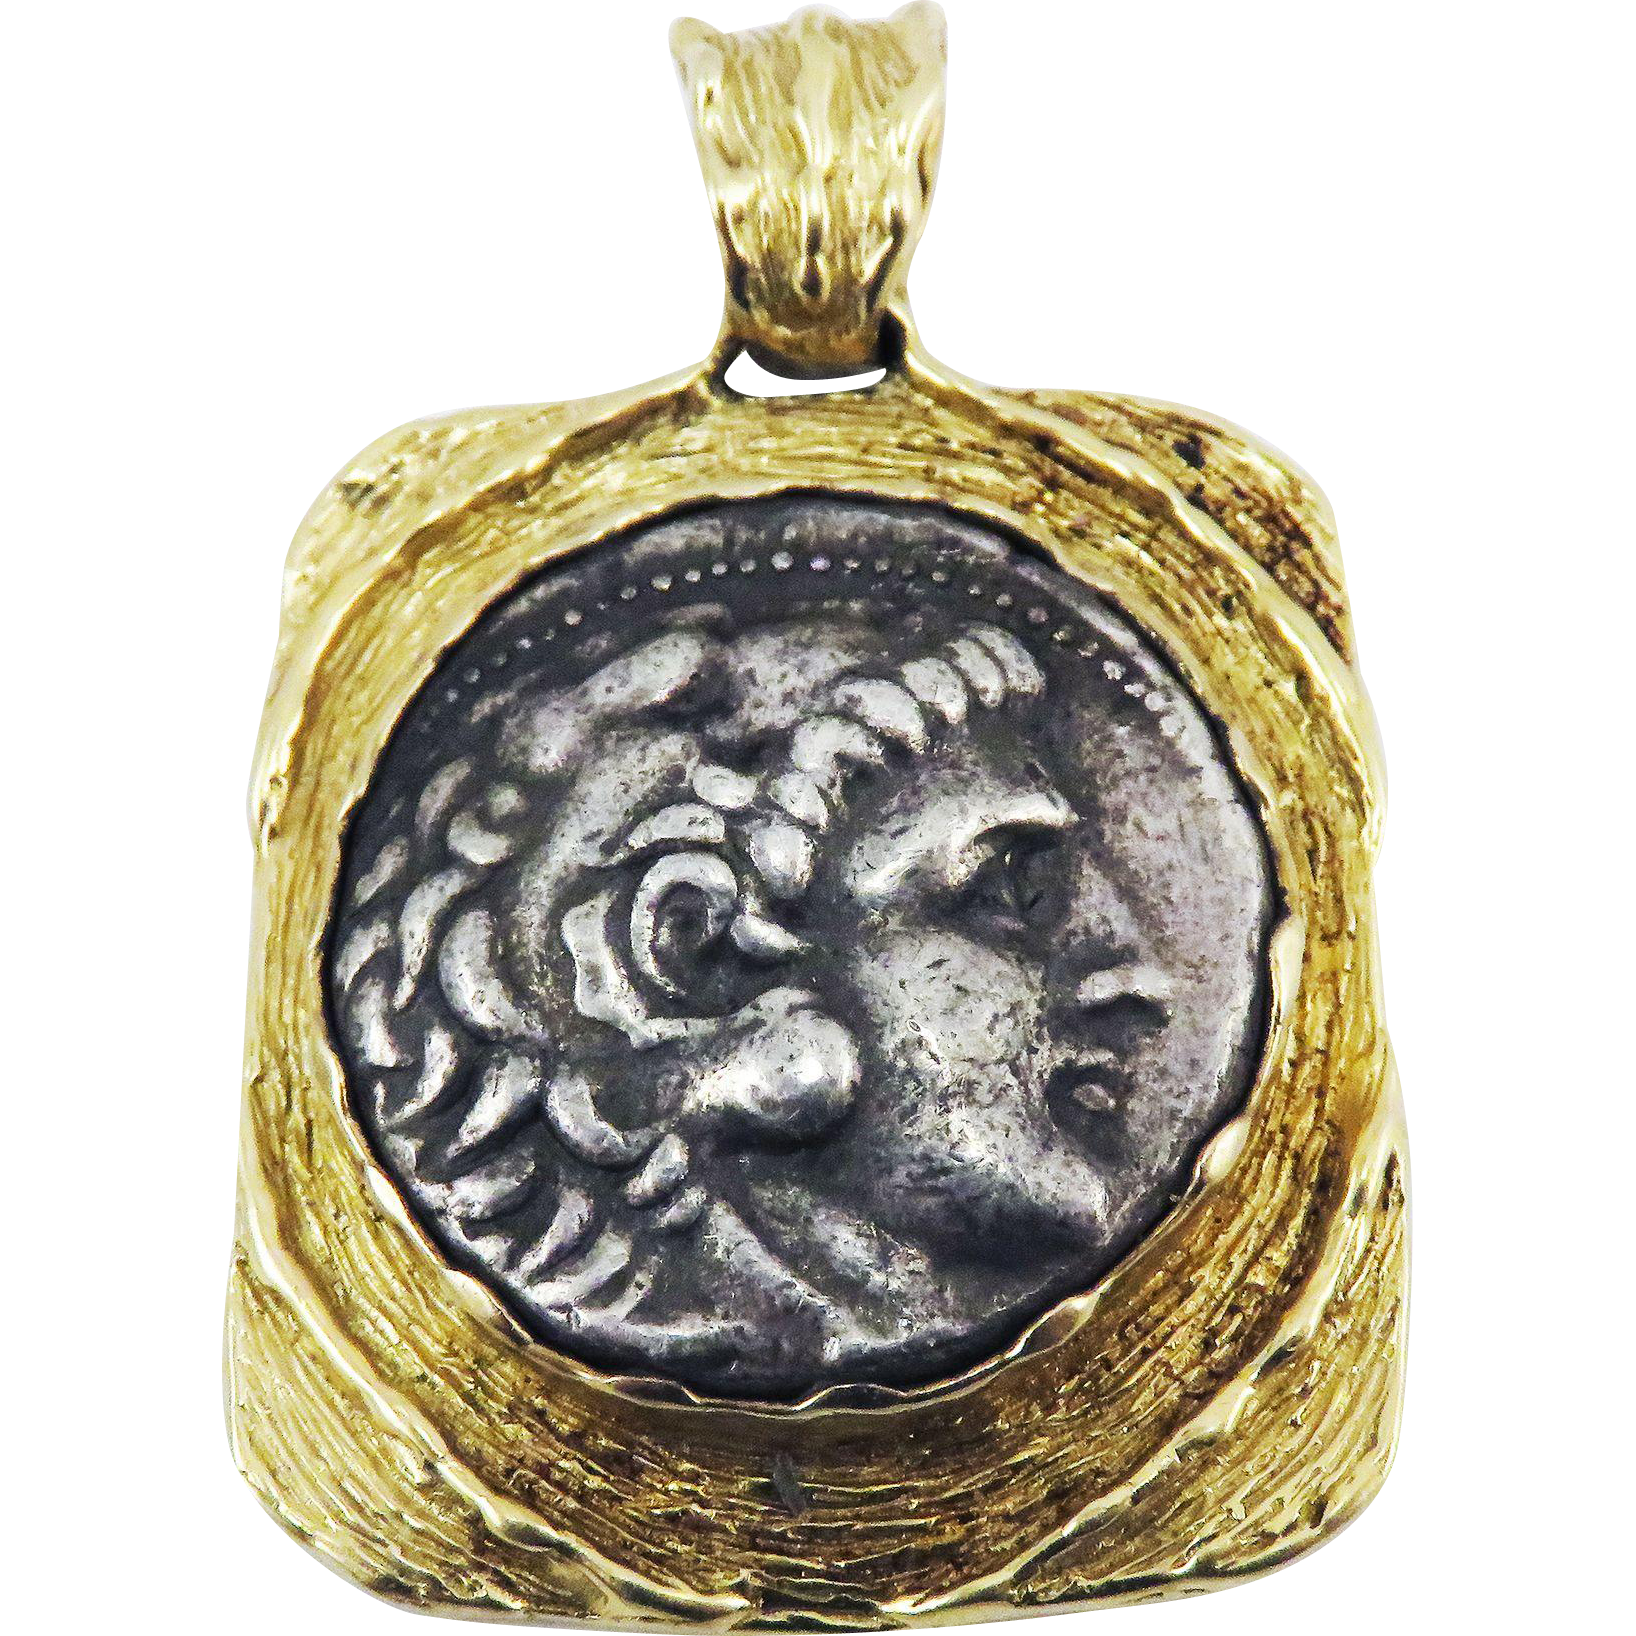 LIFETIME ISSUED XF+ Greek Silver Tetradrachm of Alexander the Great Mounted in Modern 14k Pendant, 27.14 Grams, c.335 BCE!